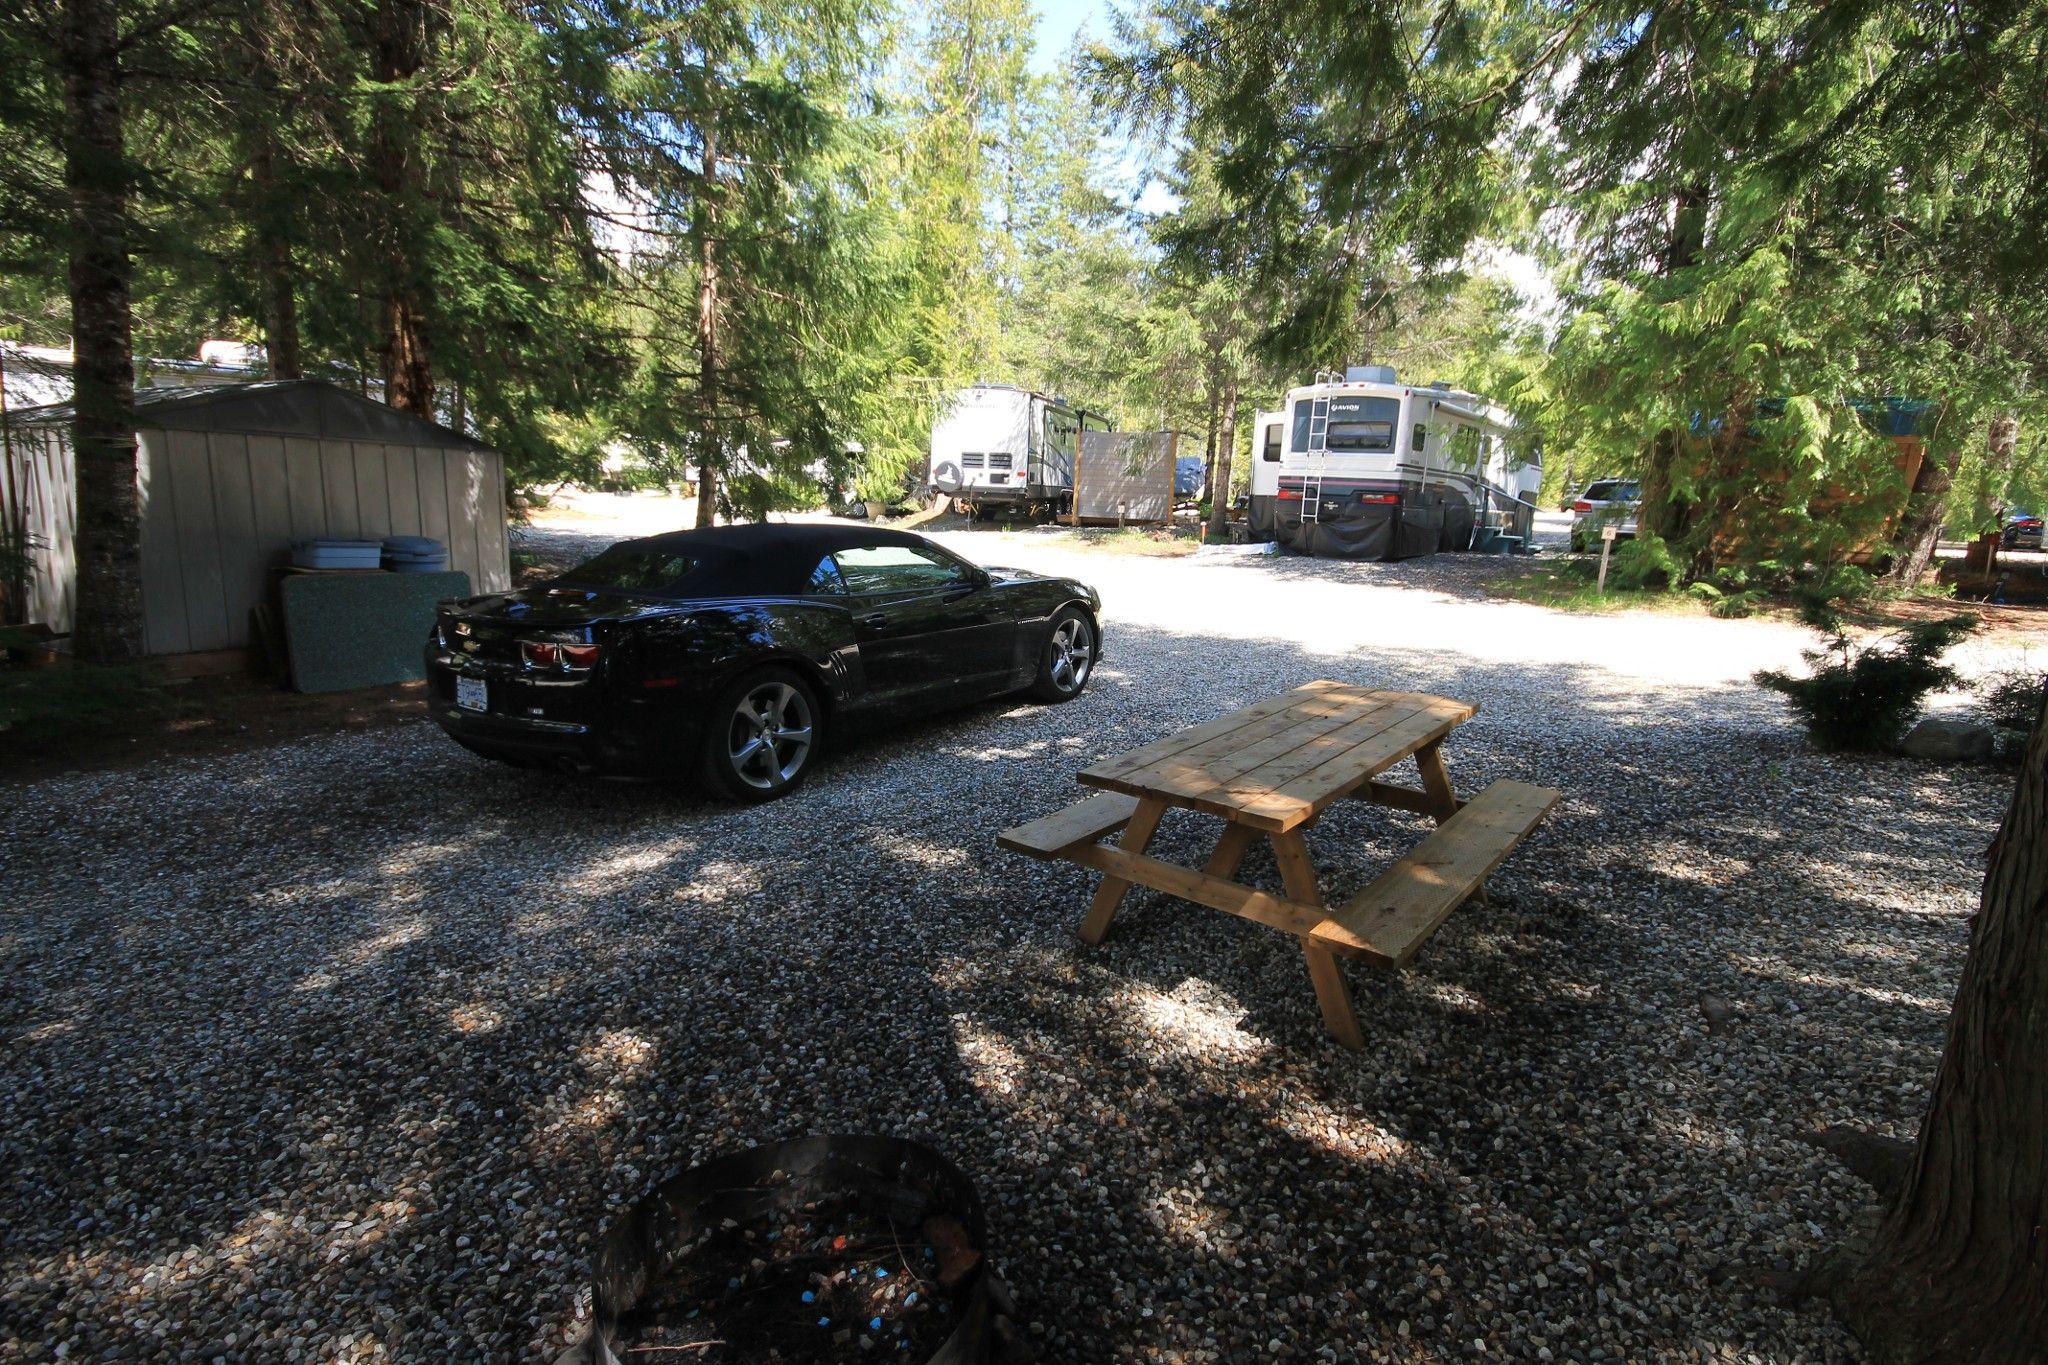 Main Photo: 19 3499 Luoma Road in : Cedars RV Resort Recreational for sale : MLS®# 10223853